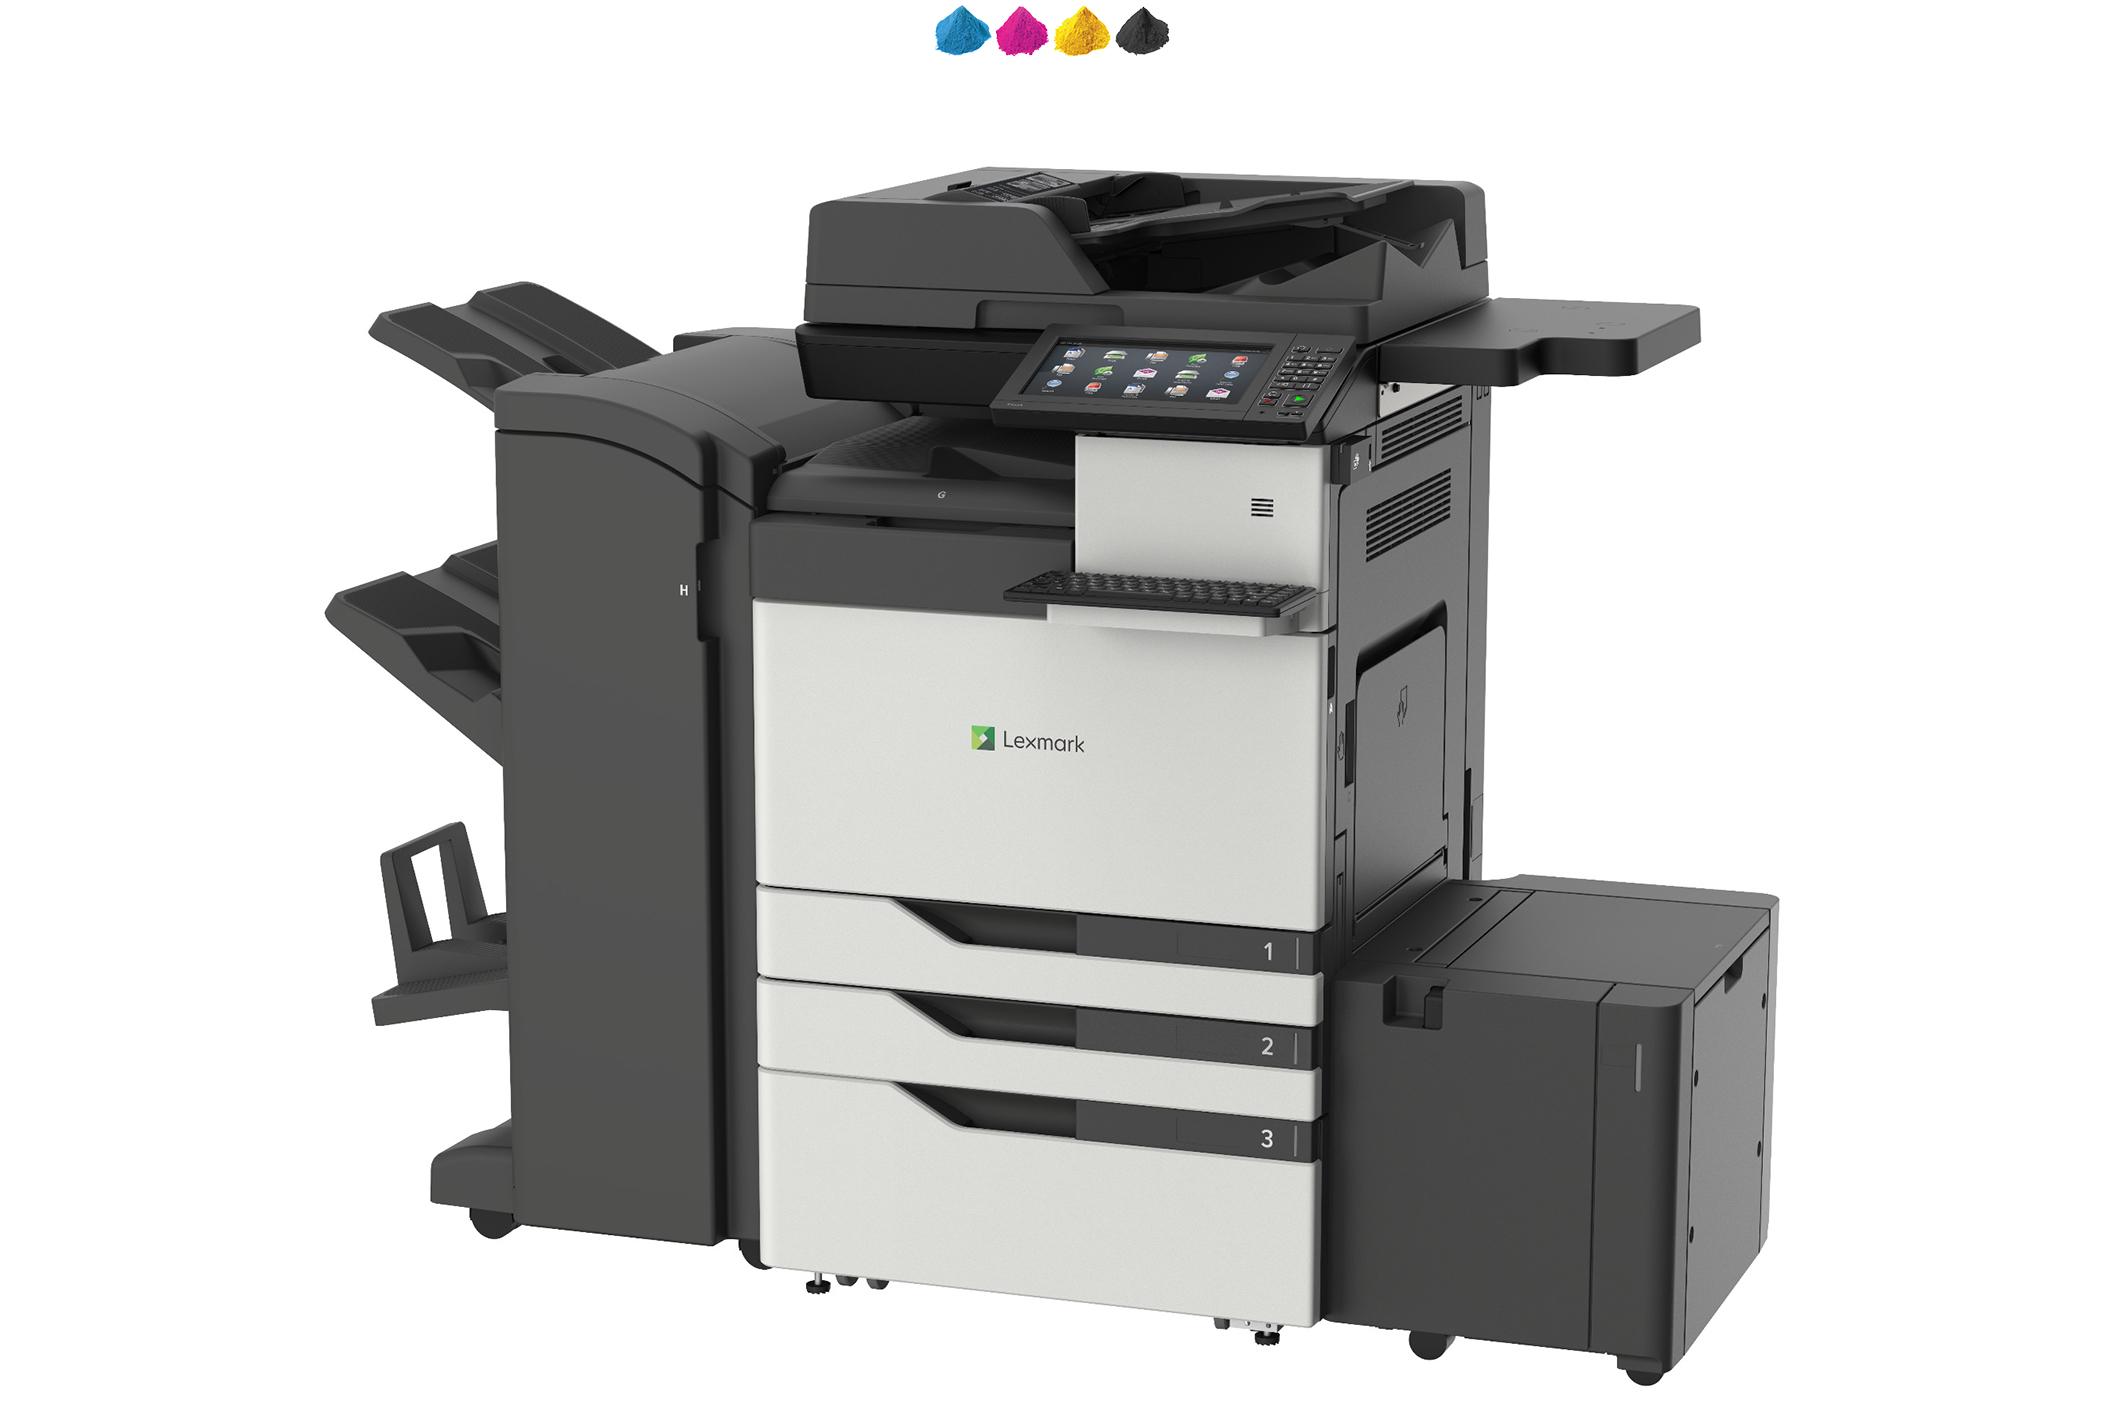 Lexmark XC9255 A3 Colour Multifunction Printer